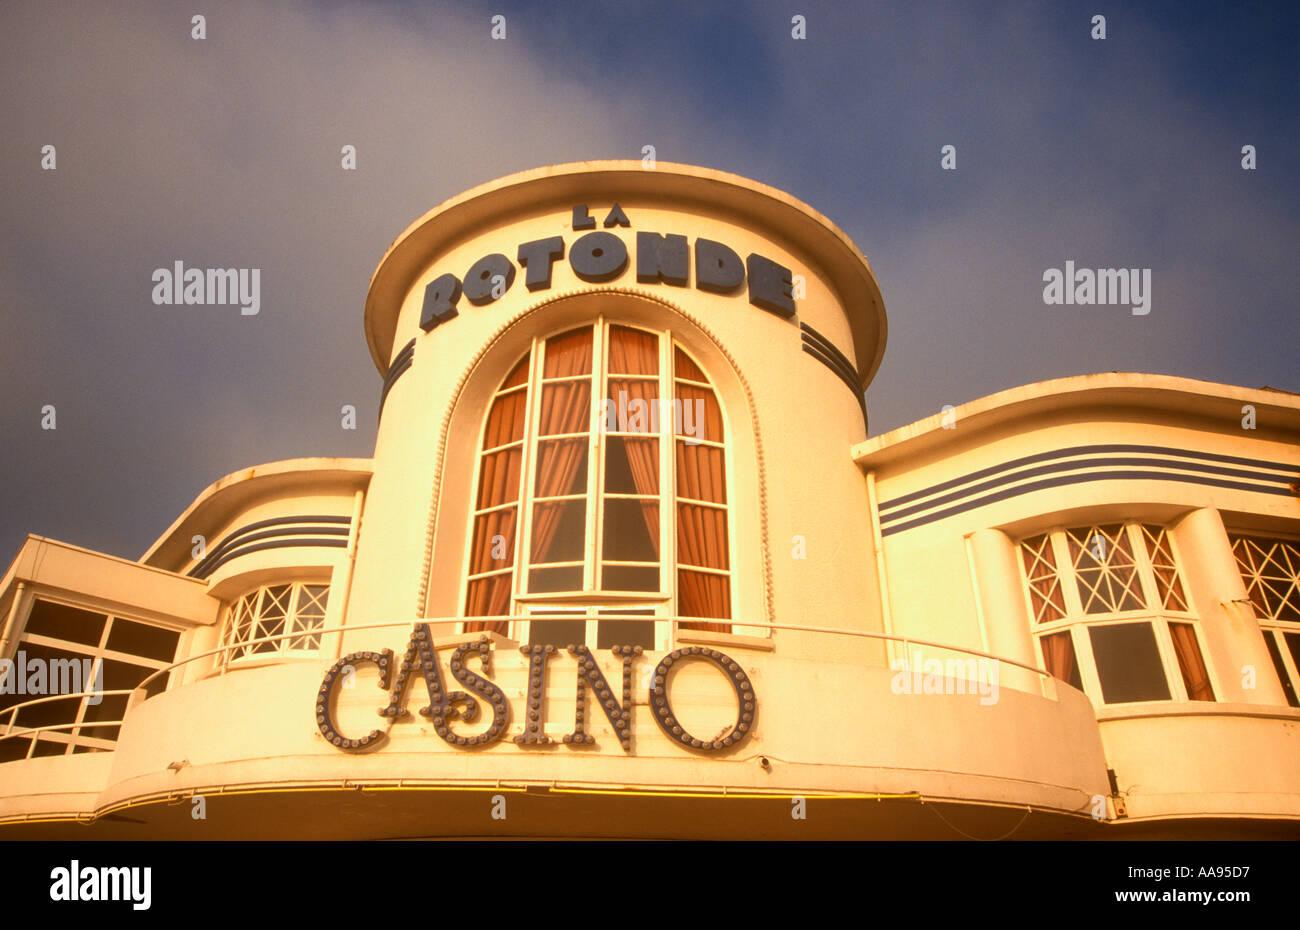 Casino pleneuf theatre roulette parts